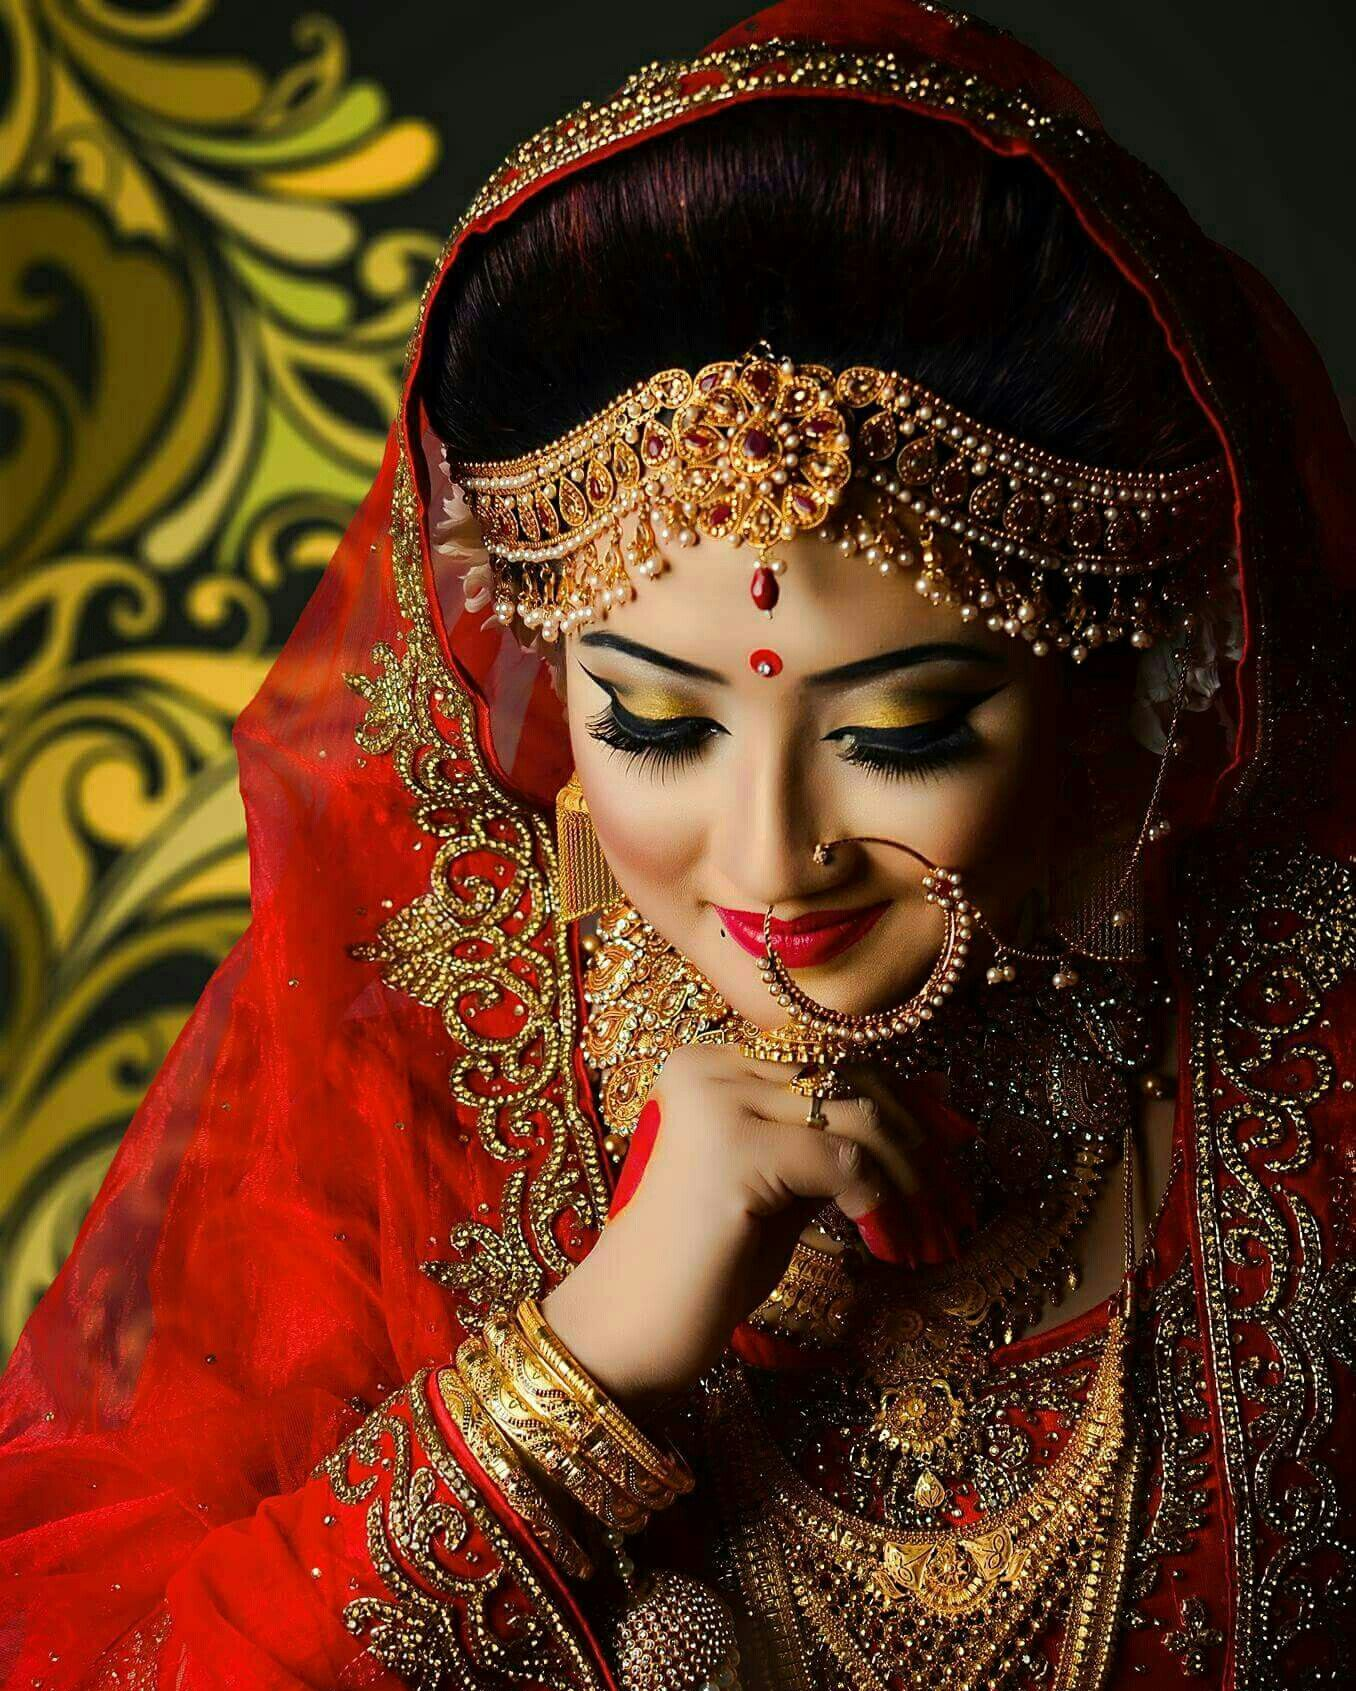 Pin de 🌹Bilge🌹 en Hintli & Pakistanlı | Pinterest | Nena y Vestiditos